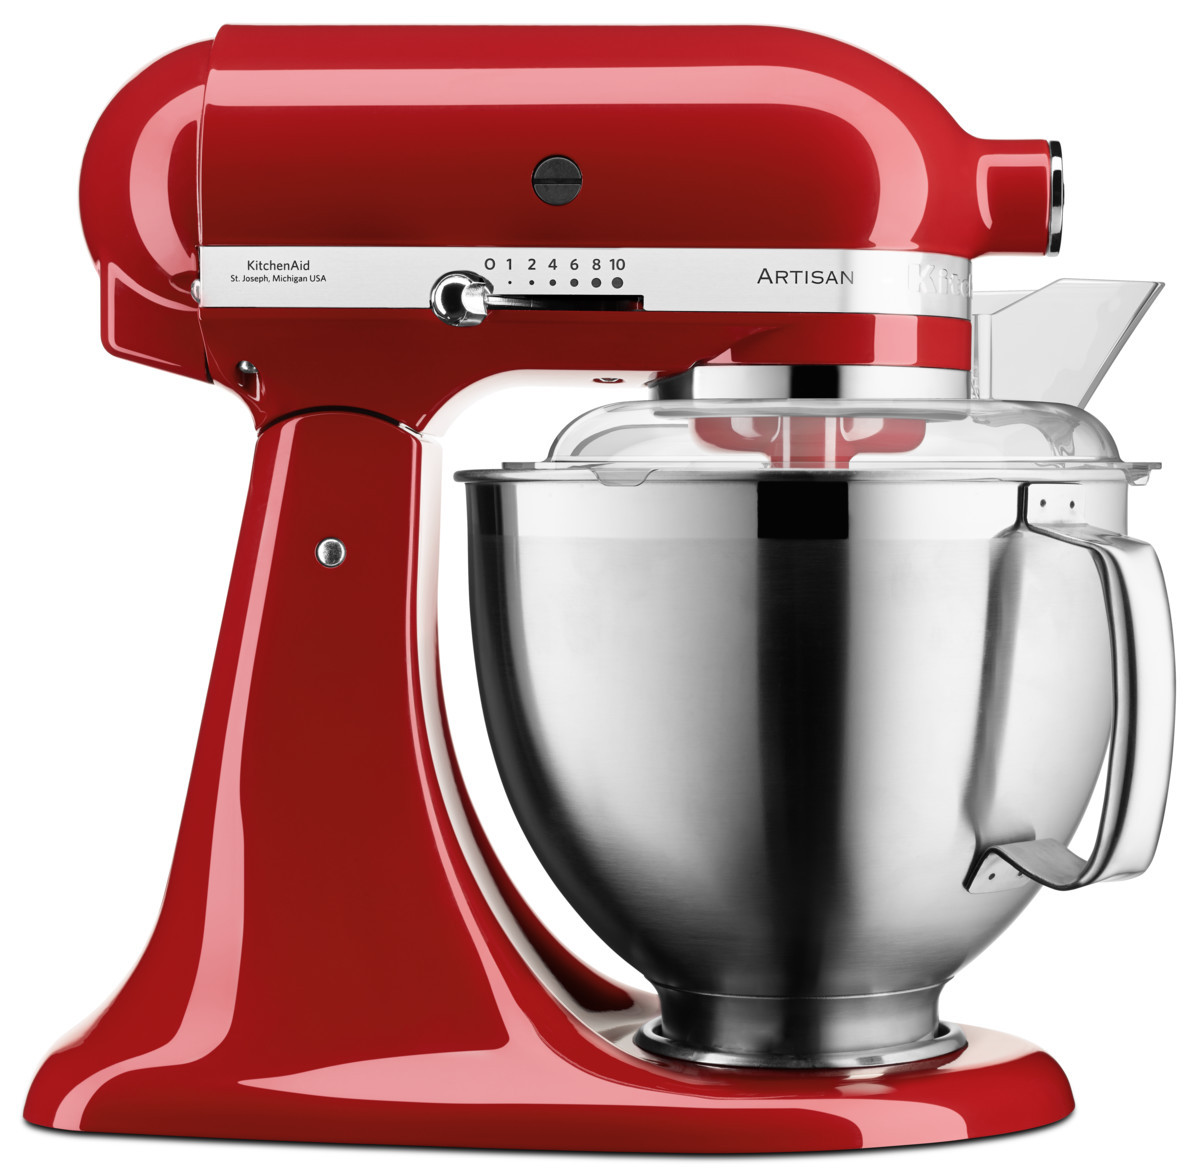 KitchenAid Küchenmaschine 5KSM185PS